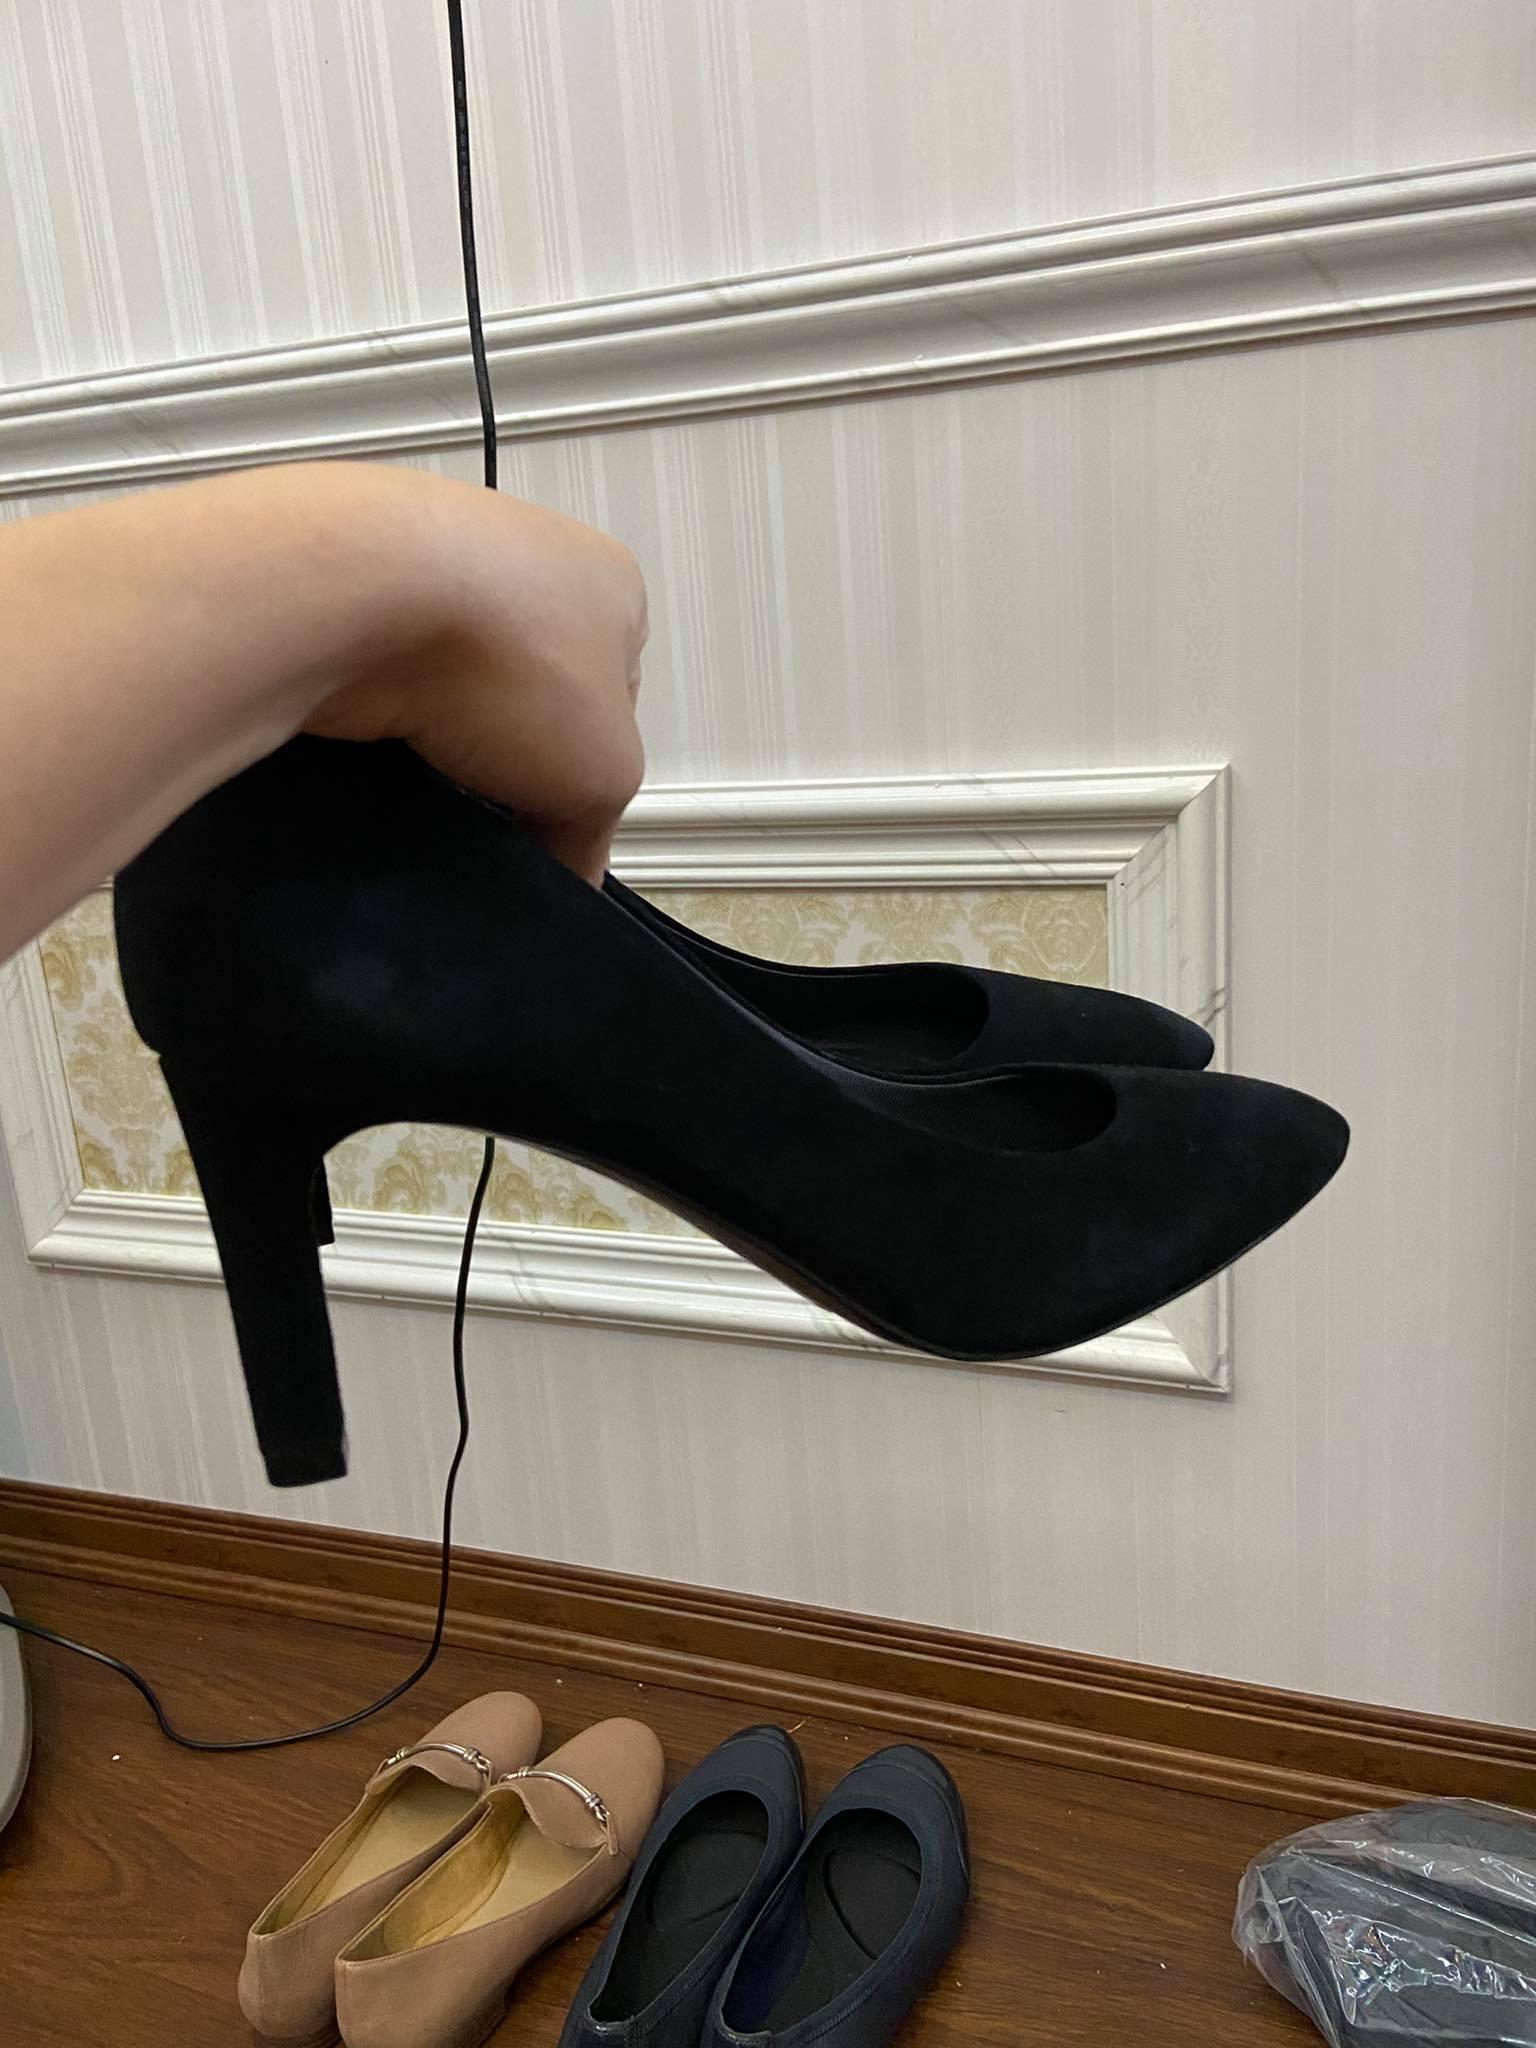 giày đen.jpg